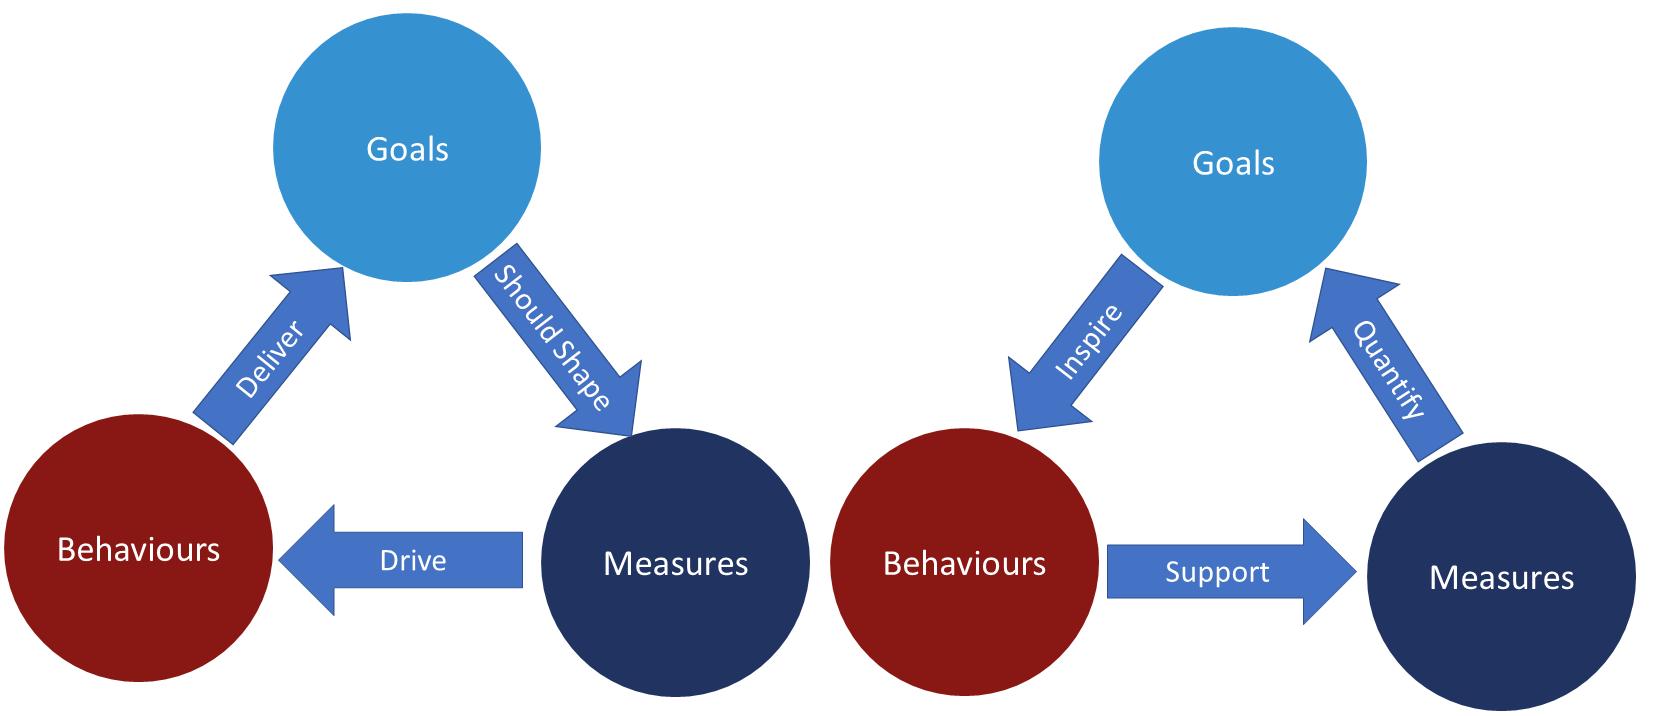 EBM Goal Measures Behaviours